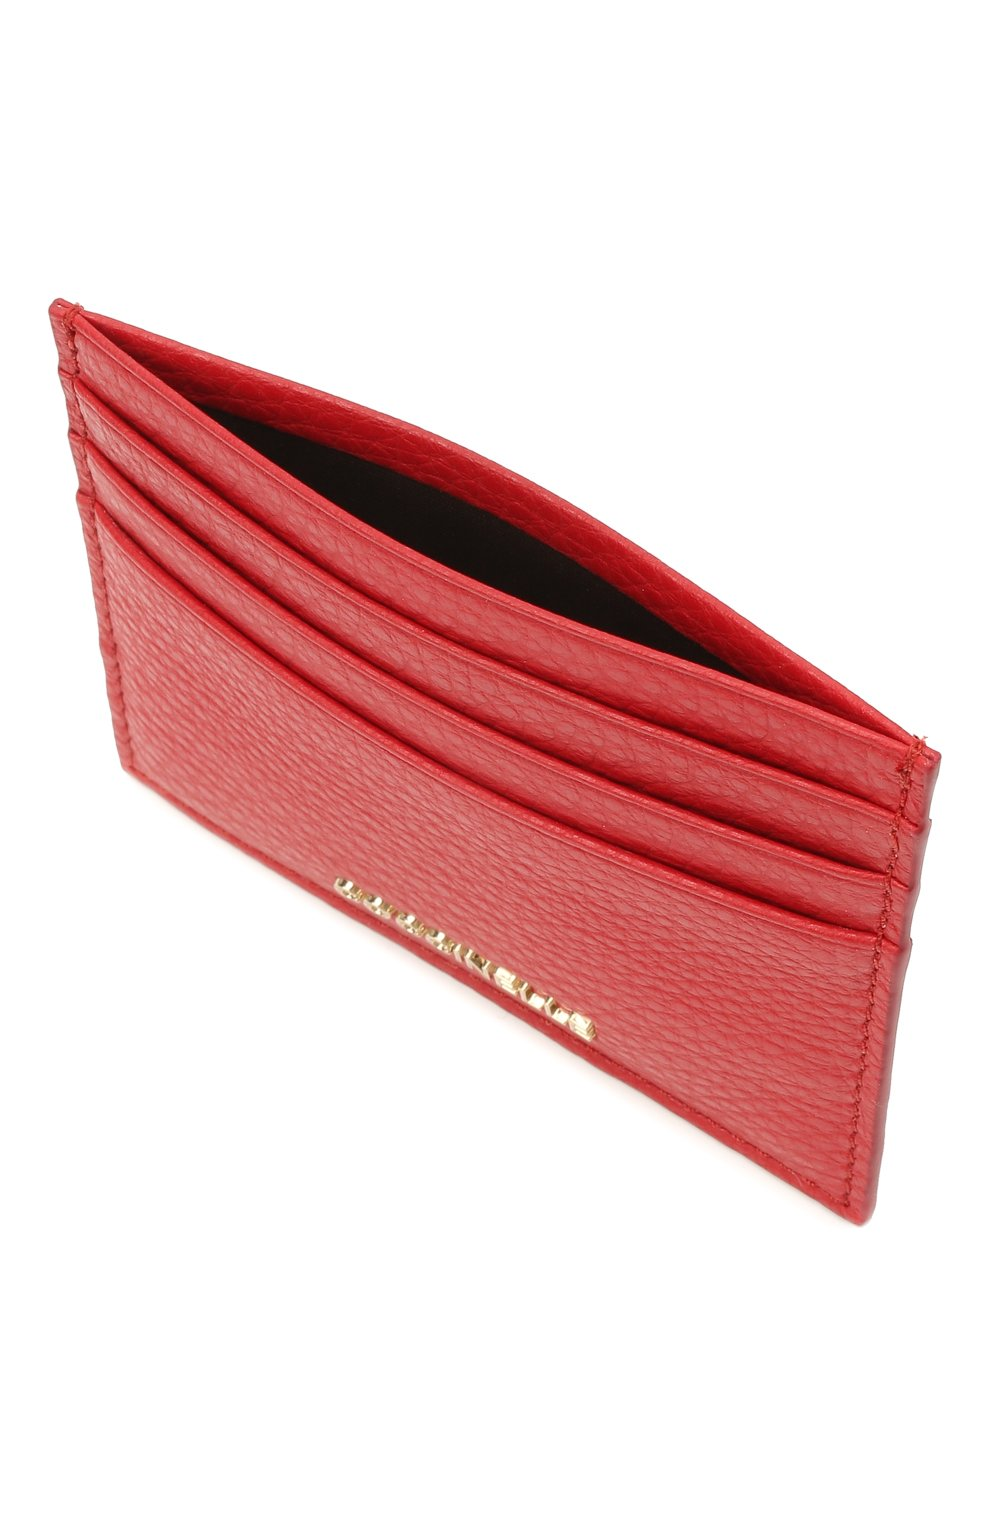 Женский кожаный футляр для кредитных карт COCCINELLE красного цвета, арт. E2 HW5 12 95 01   Фото 3